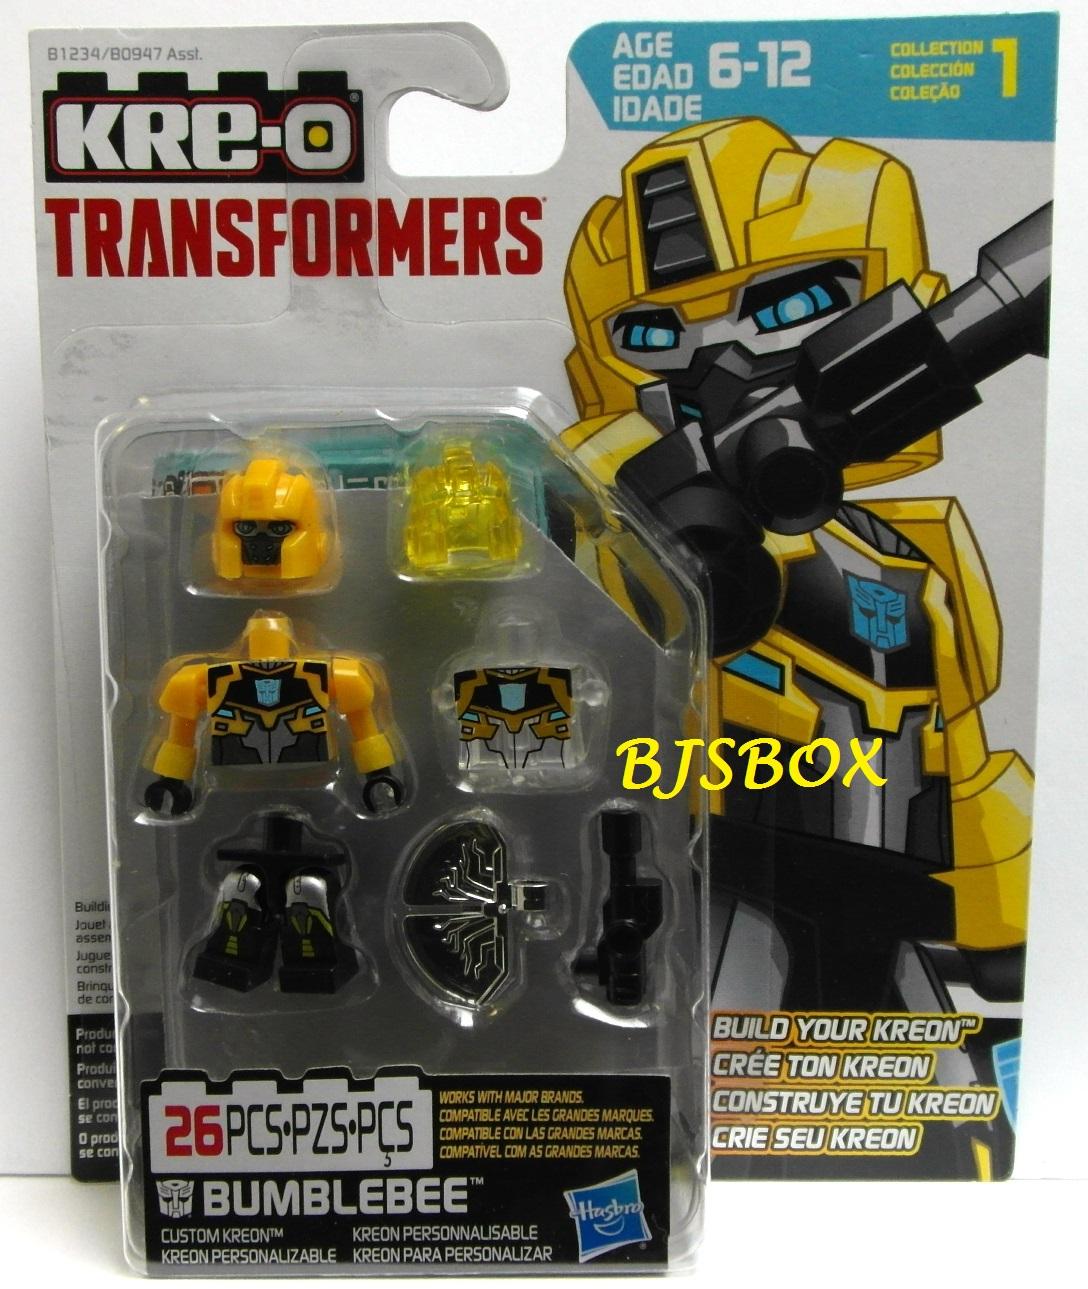 Kre O Transformers Bumblebee Custom Kreon Figure 26 Pcs Collection